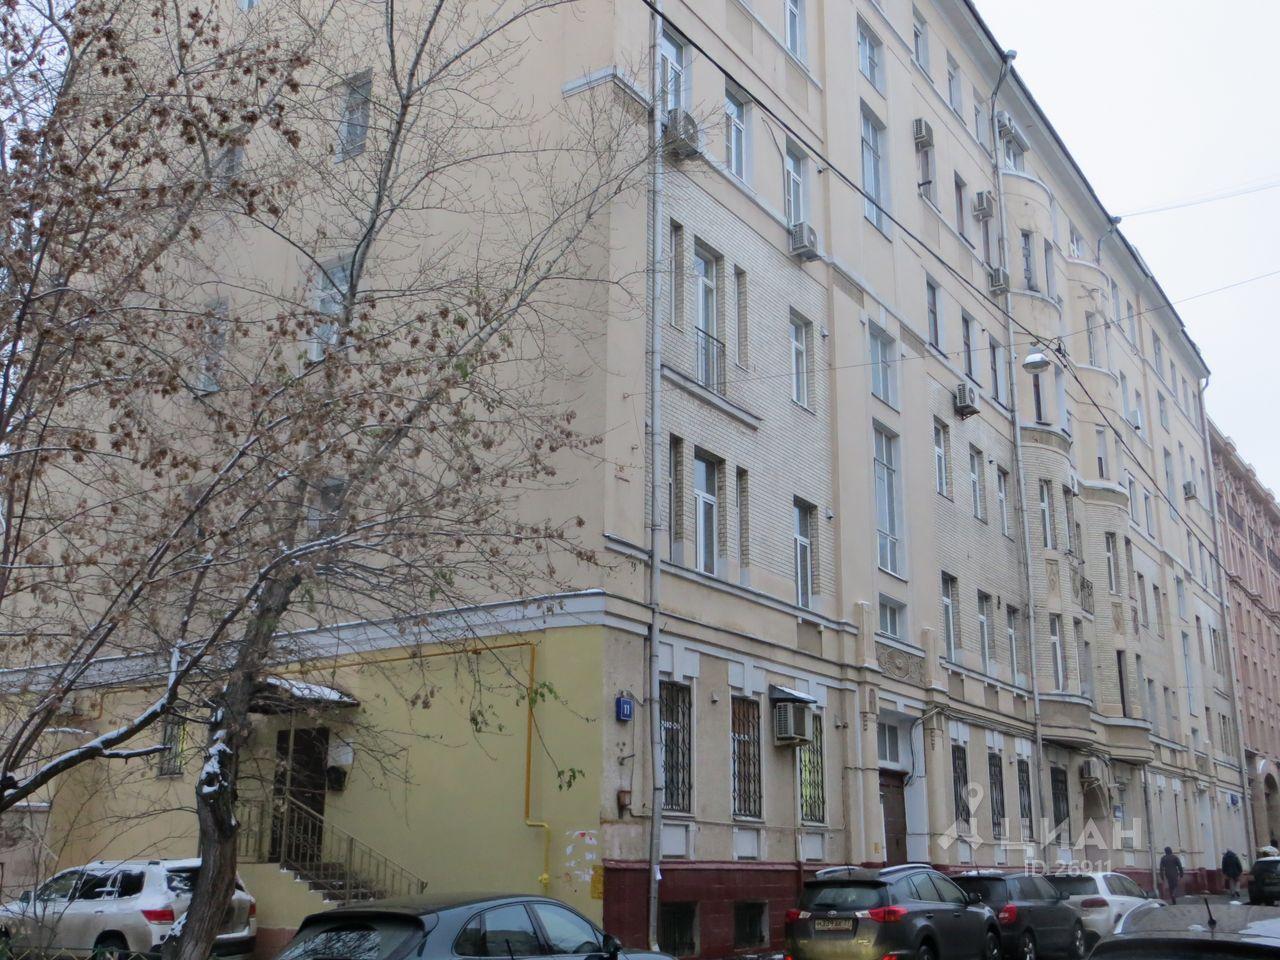 kvartira-moskva-skatertnyy-pereulok-326379617-1